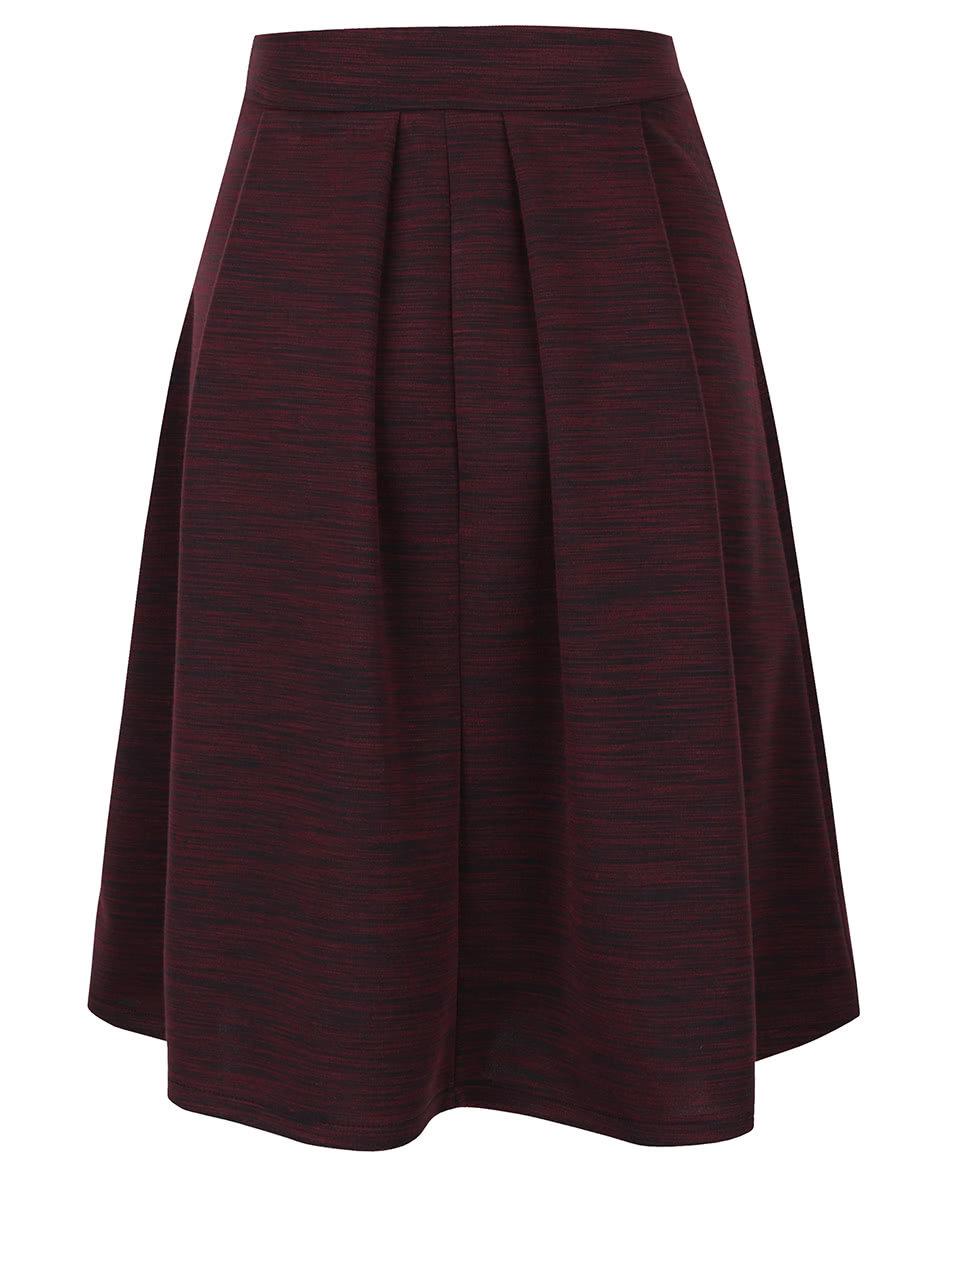 0f17c8ae5c91 Vínová žíhaná áčková sukně Alchymi Cora ...